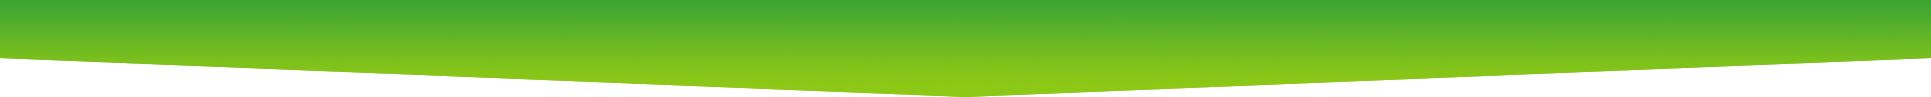 green-slider-bg-arrow